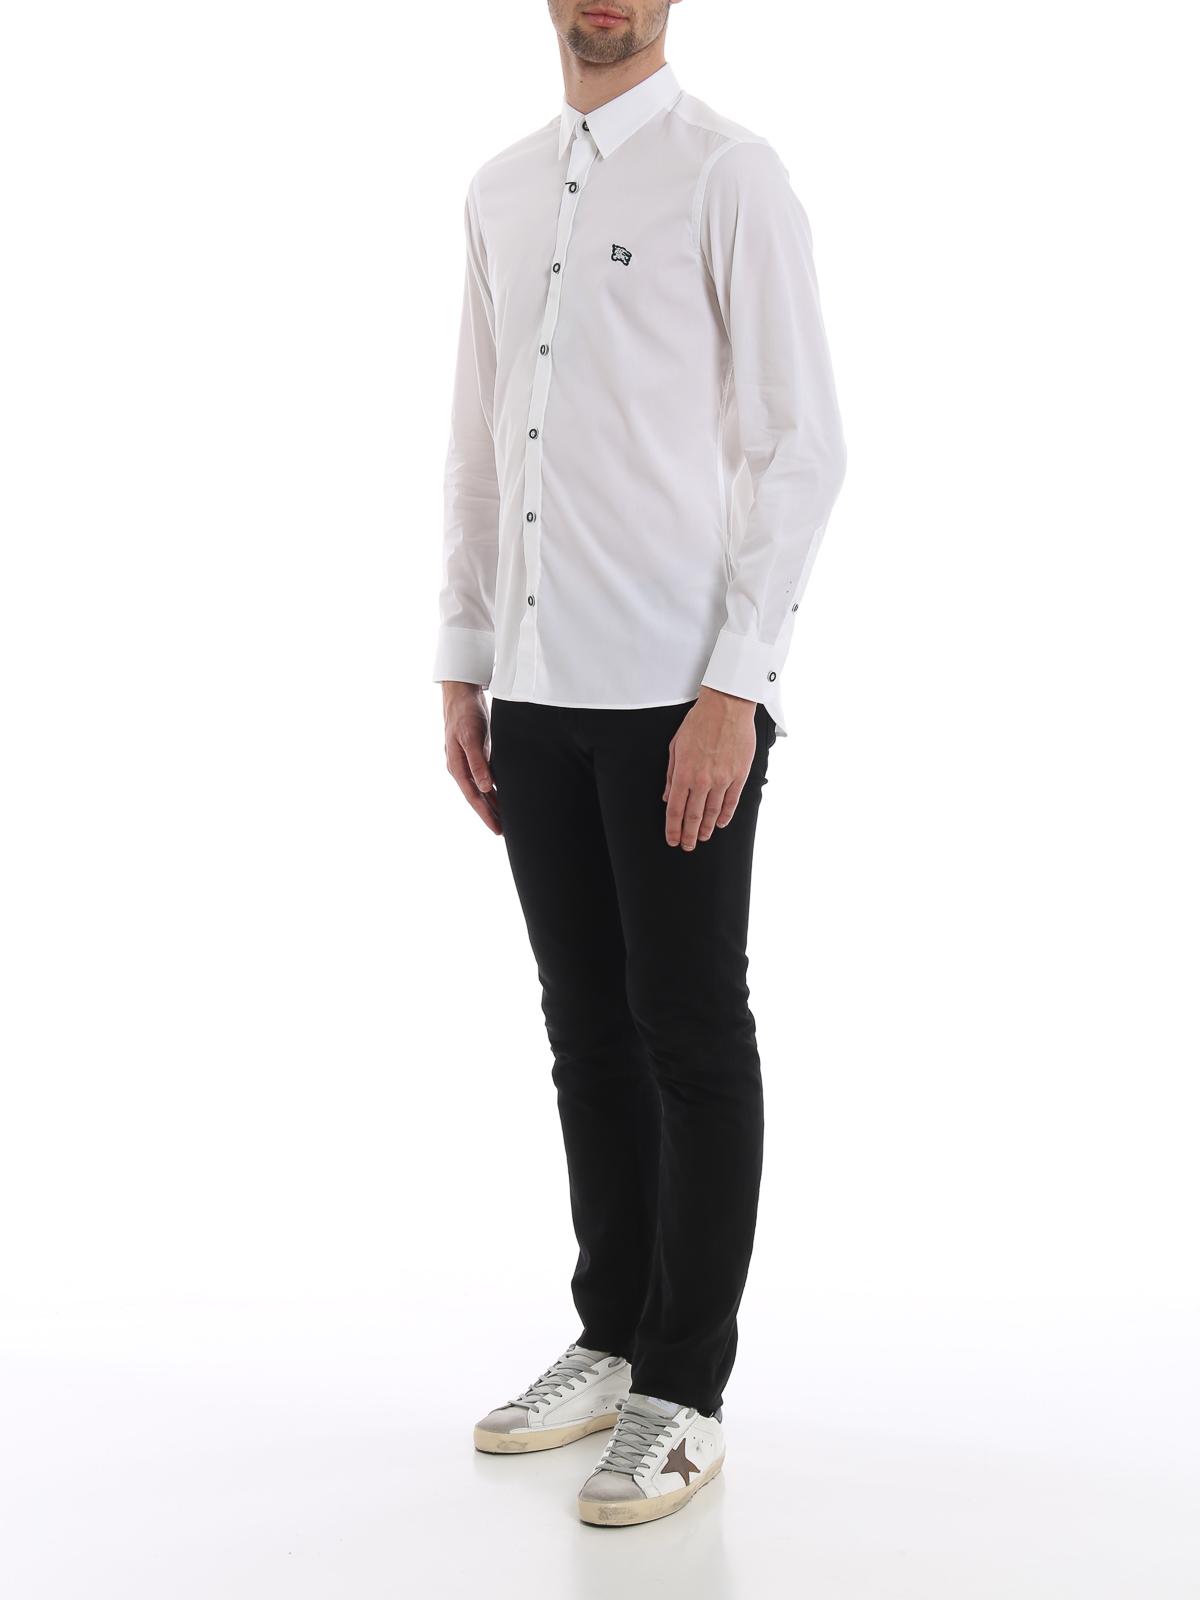 Burberry Hemd Weiß Hemden 8004959